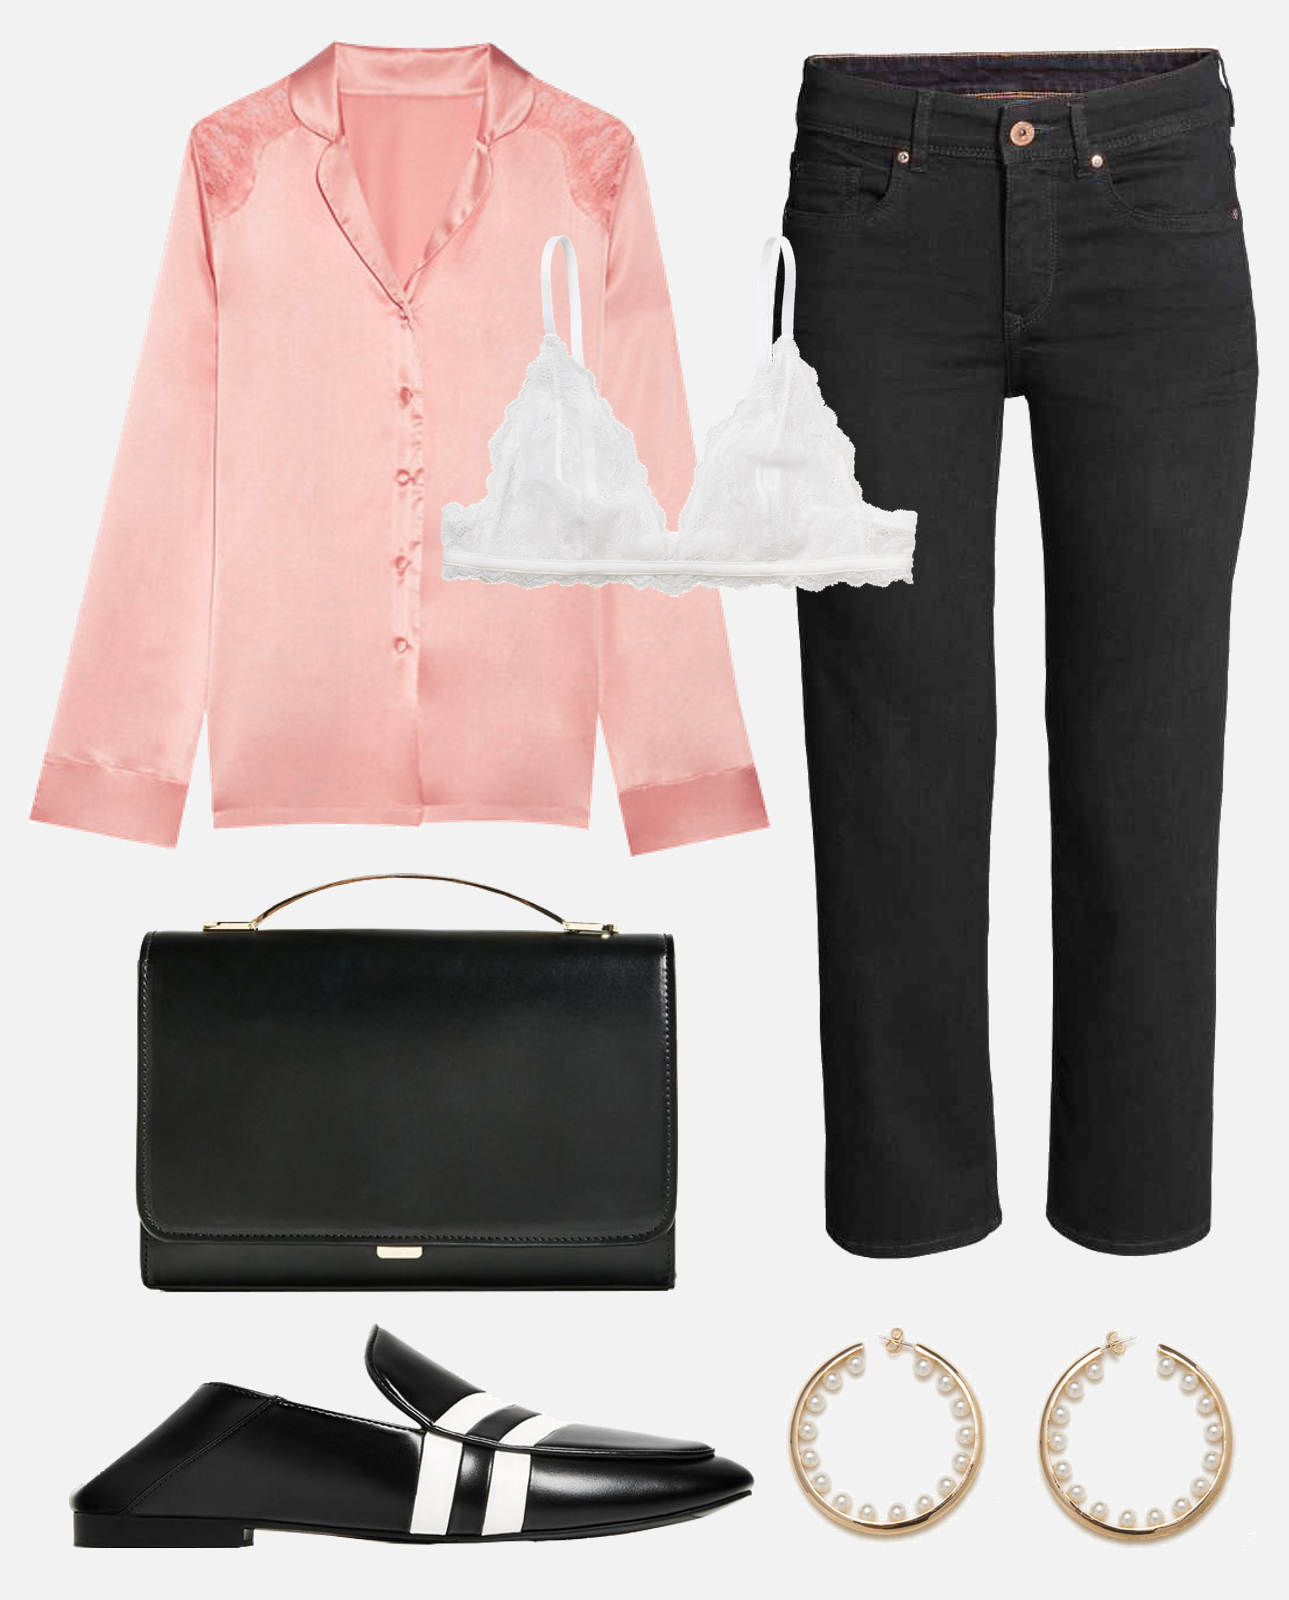 zara mocassim blackshoes silk shirt pink h&m fashion outfit ootd